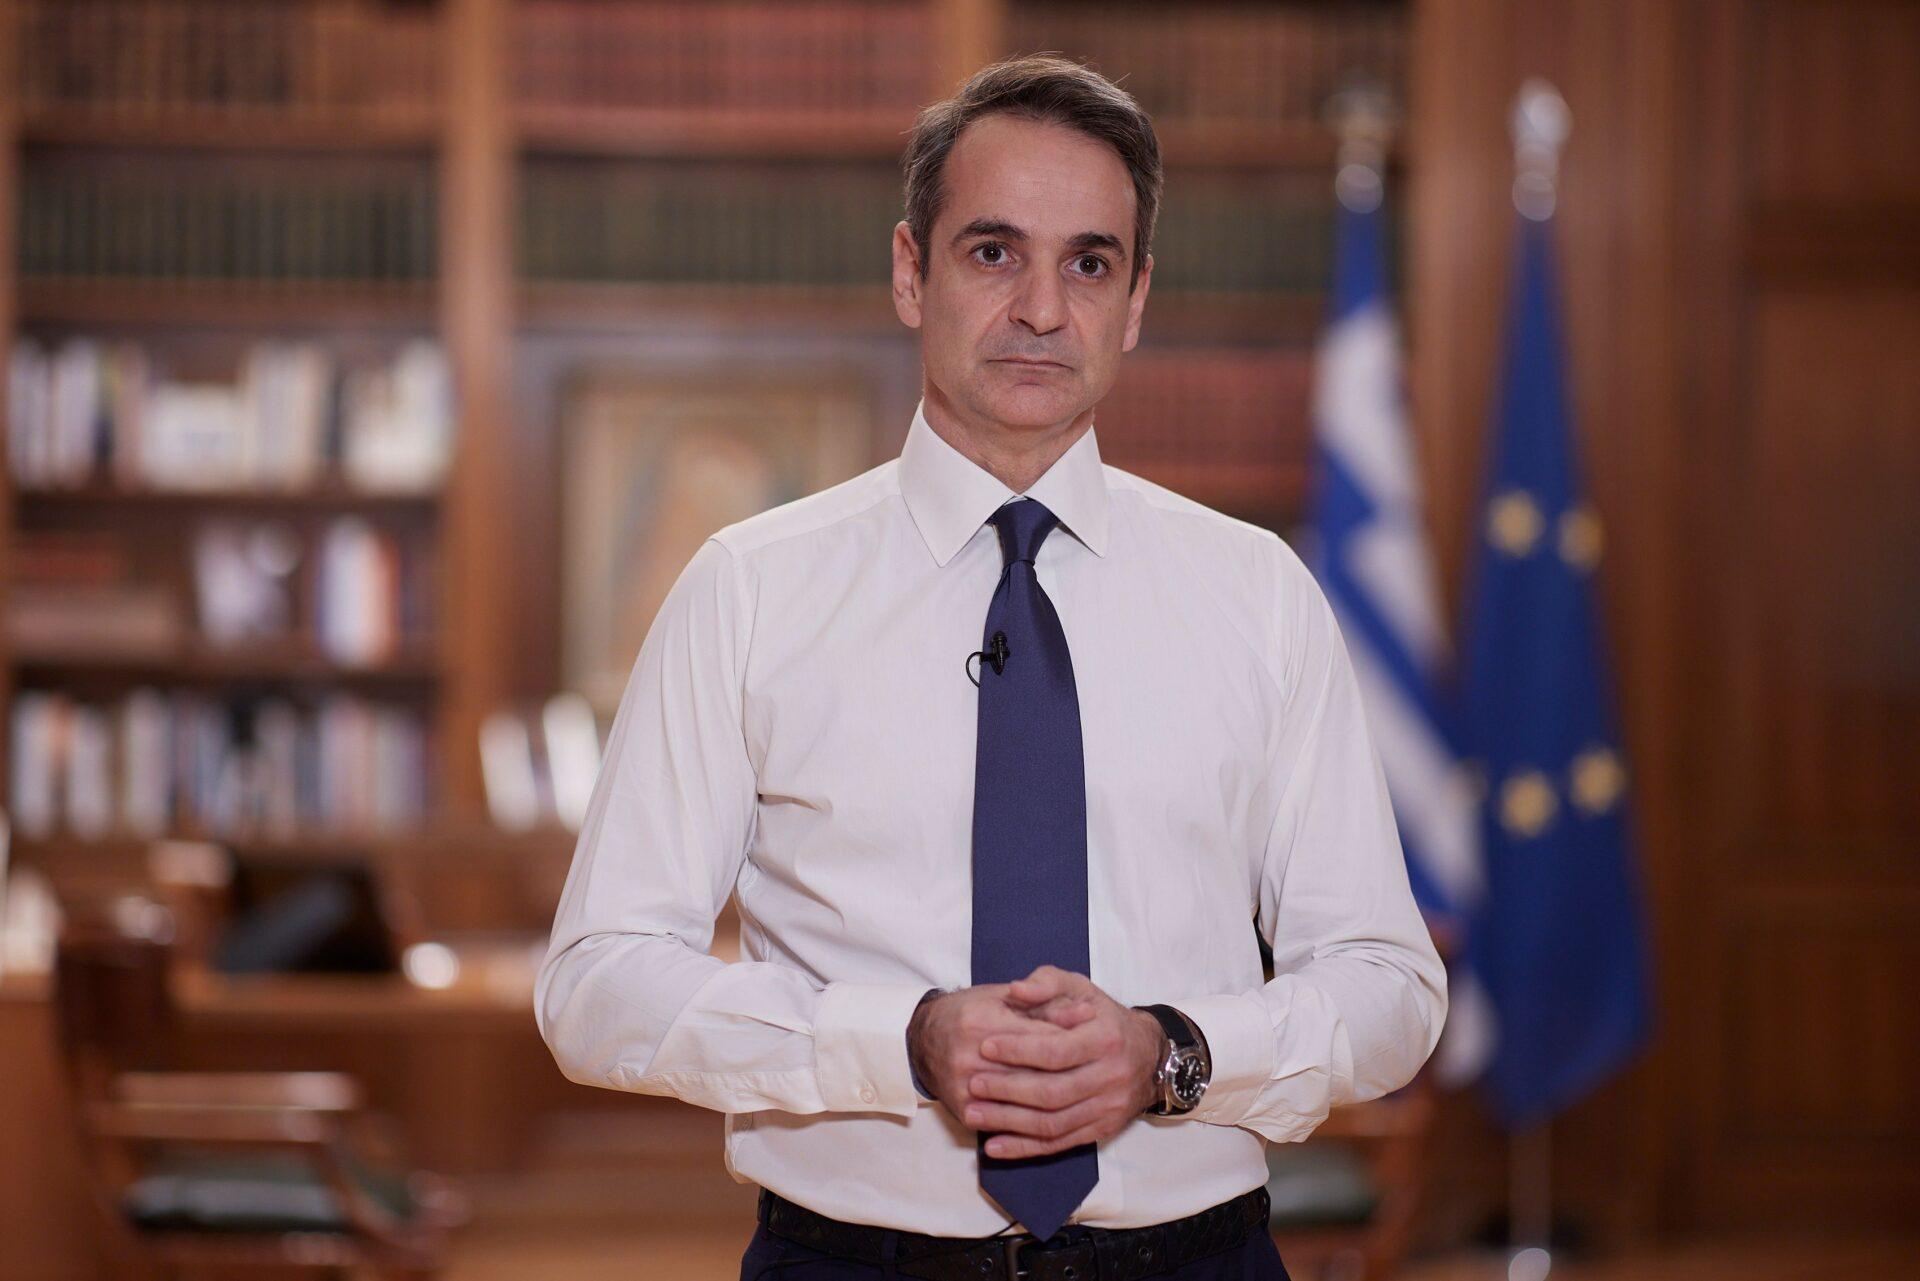 Lockdown στην Αττική: Το διάγγελμα του Πρωθυπουργού για τα νέα μέτρα